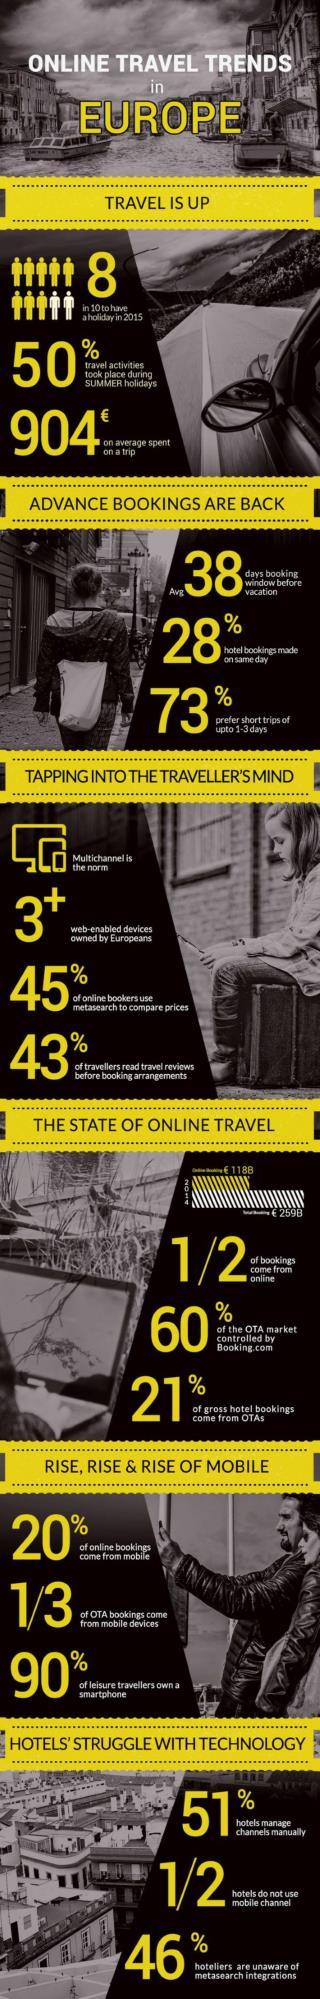 Online Travel Trends in Europe 2015